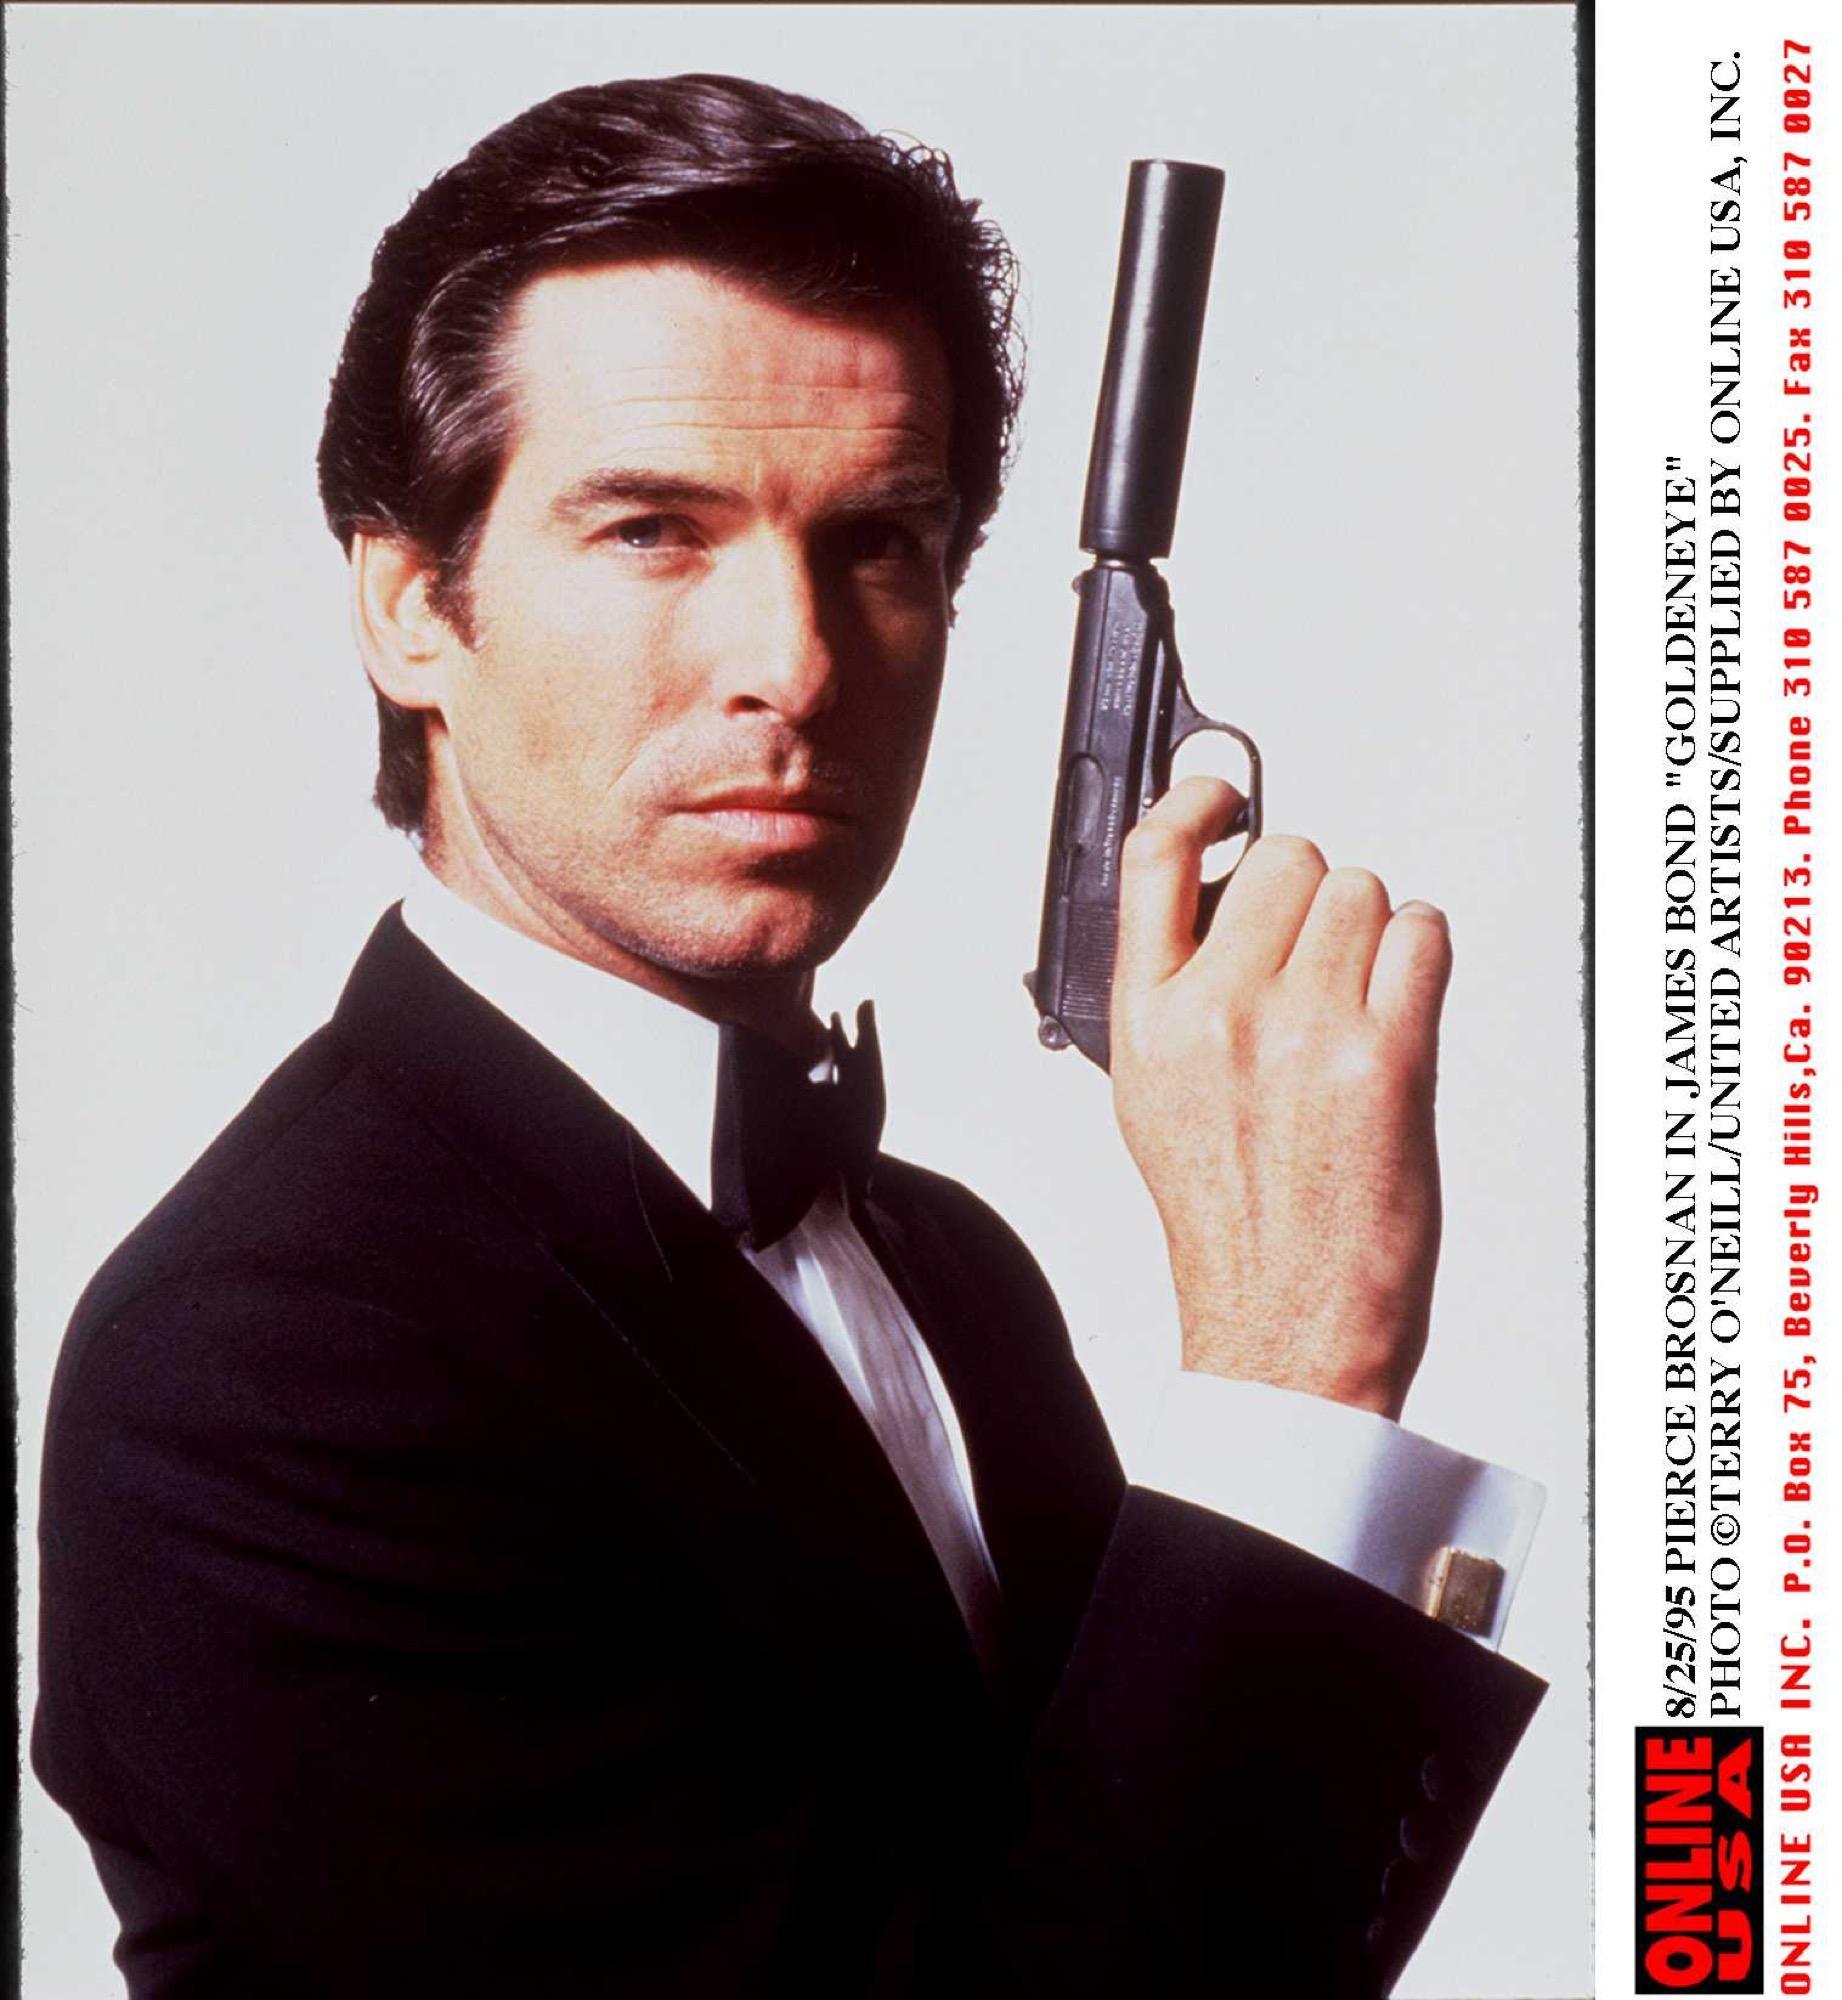 Sexiest Man Alive 2001 - Pierce Brosnan